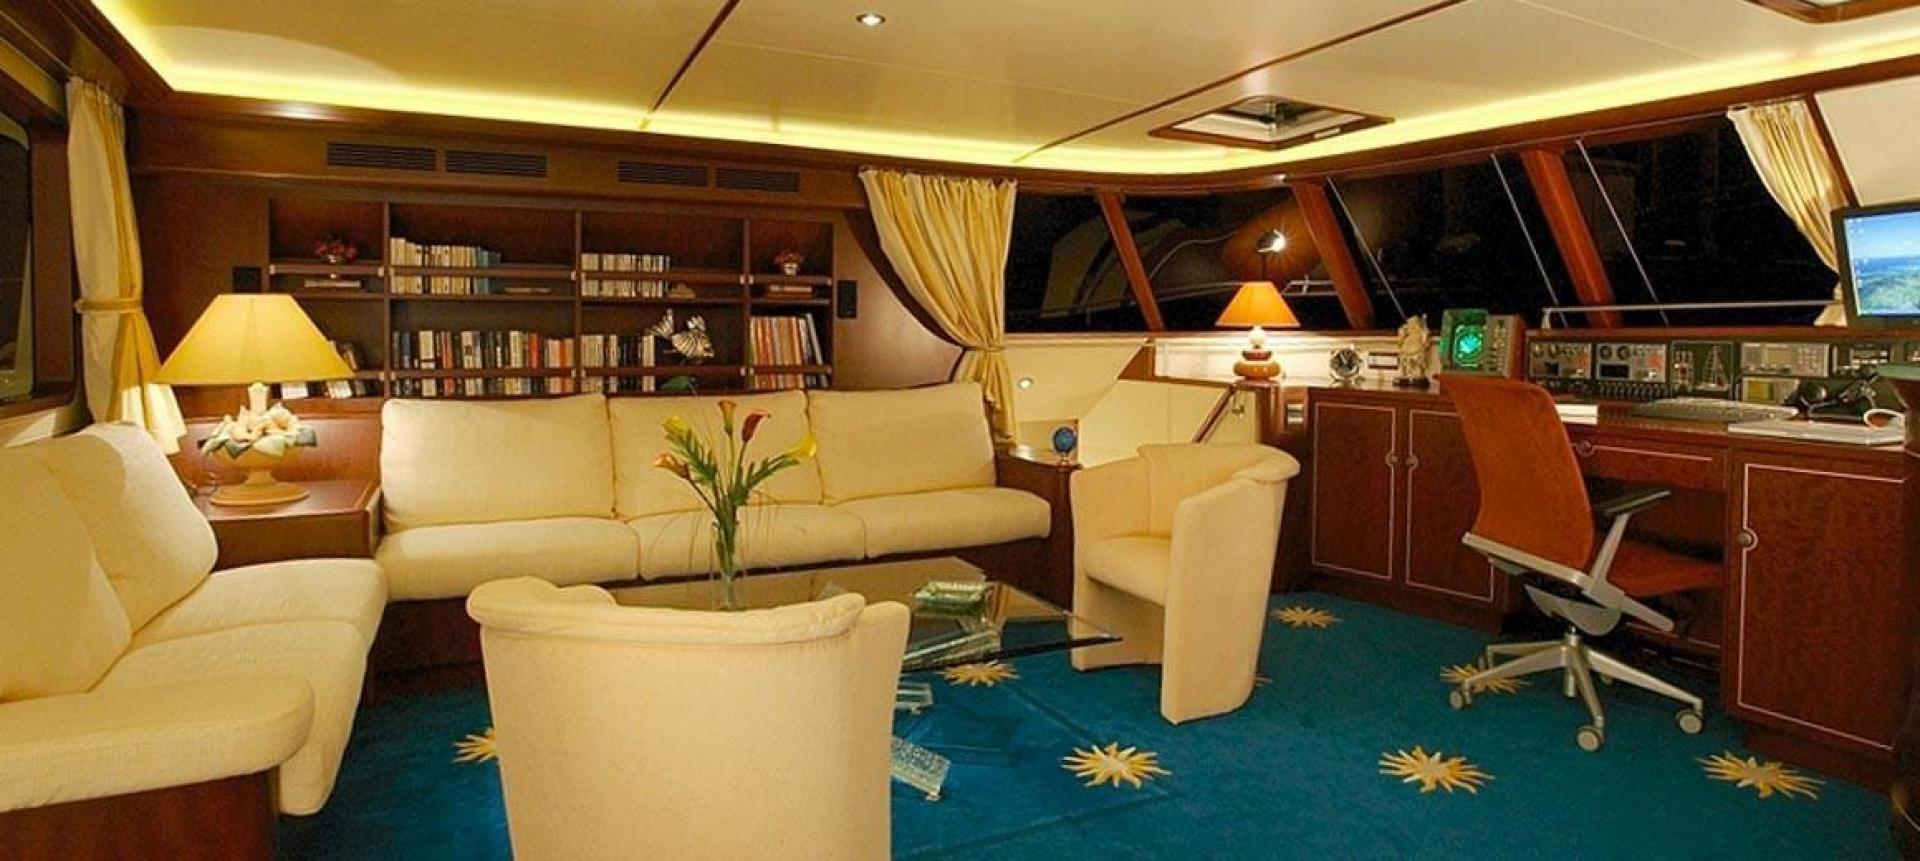 JFA-Catamaran 2004 -Miami-Florida-United States-1367456 | Thumbnail